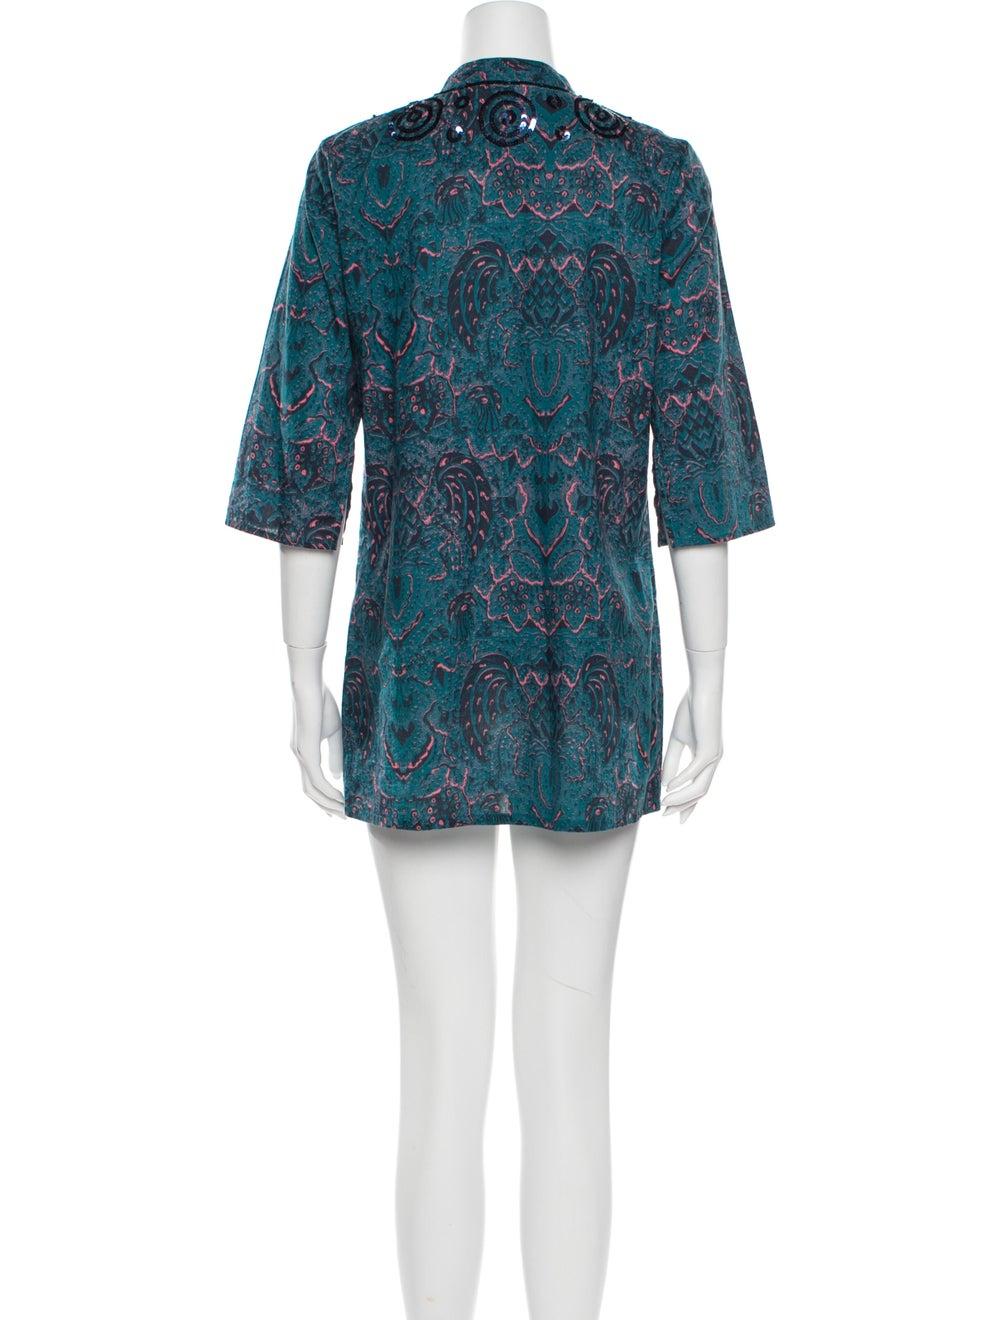 Figue Paisley Print Mini Dress - image 3